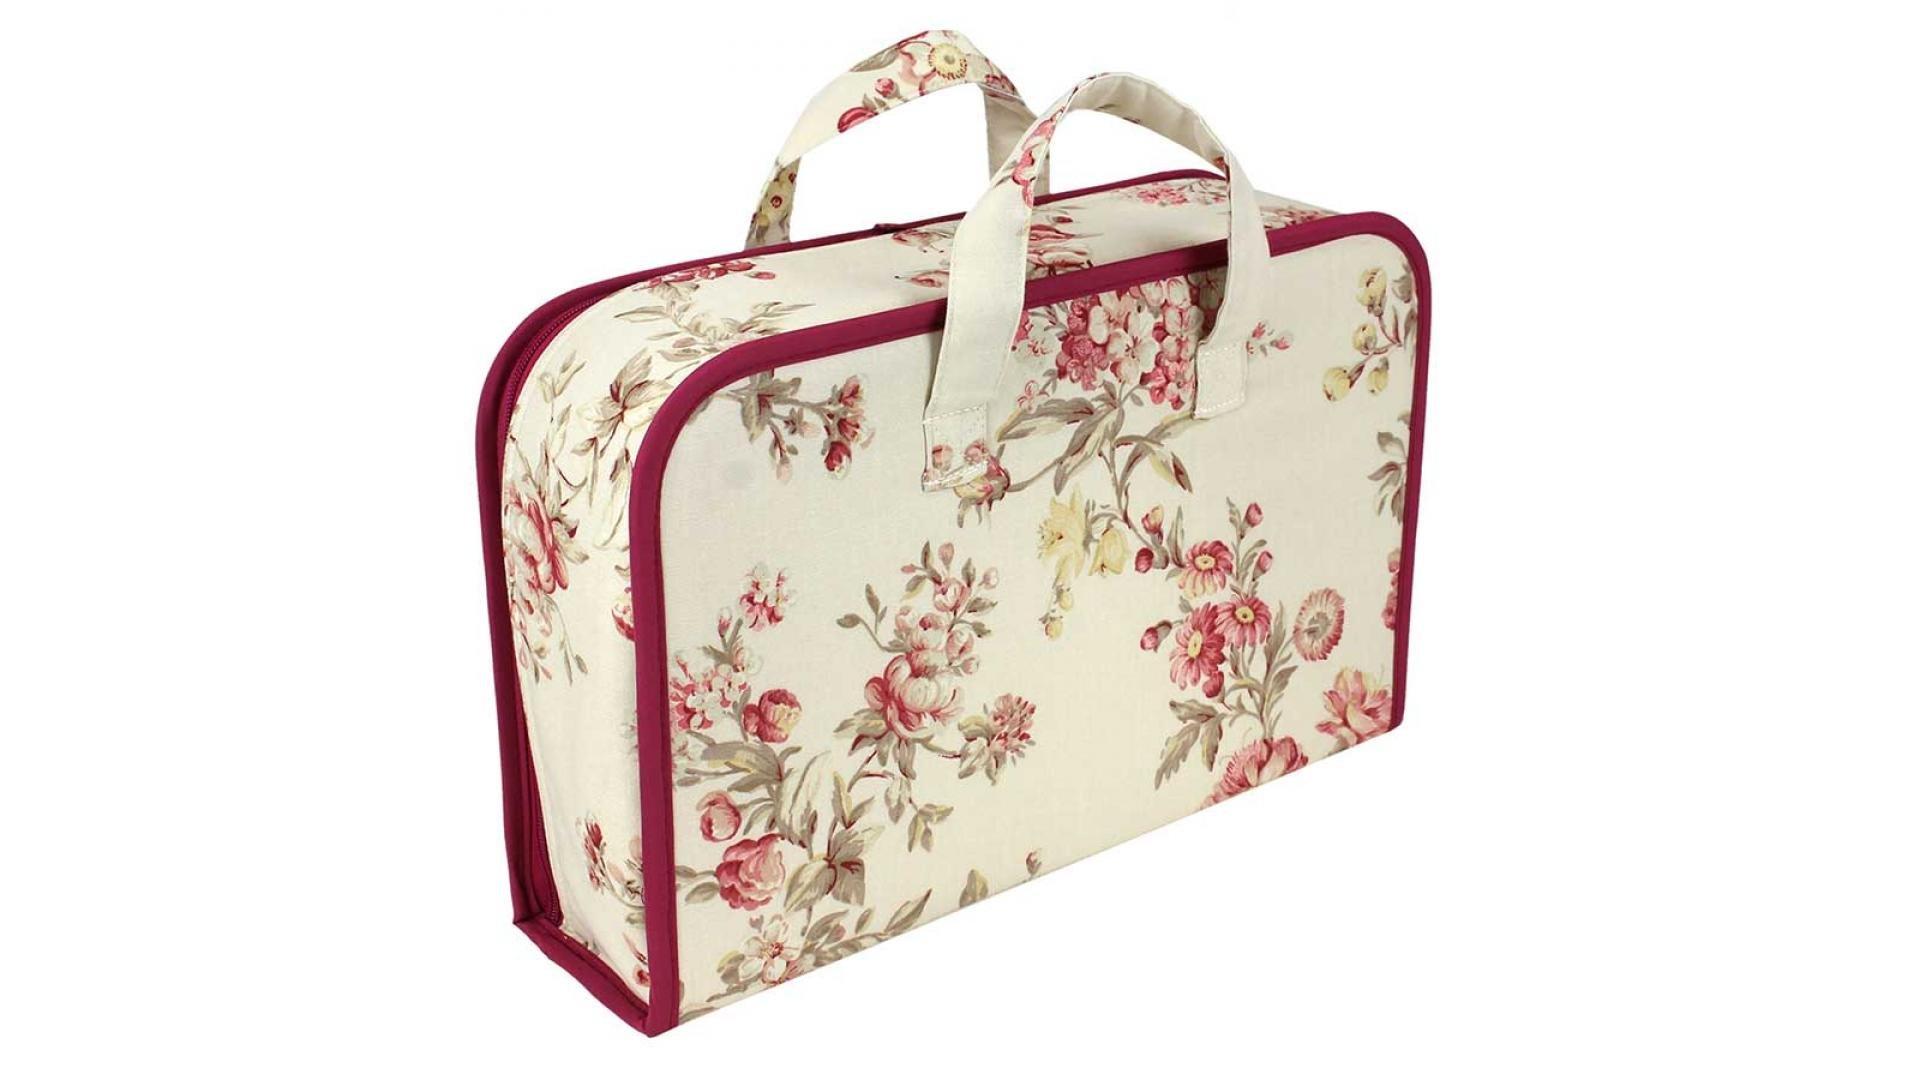 Carry Case - Light Floral